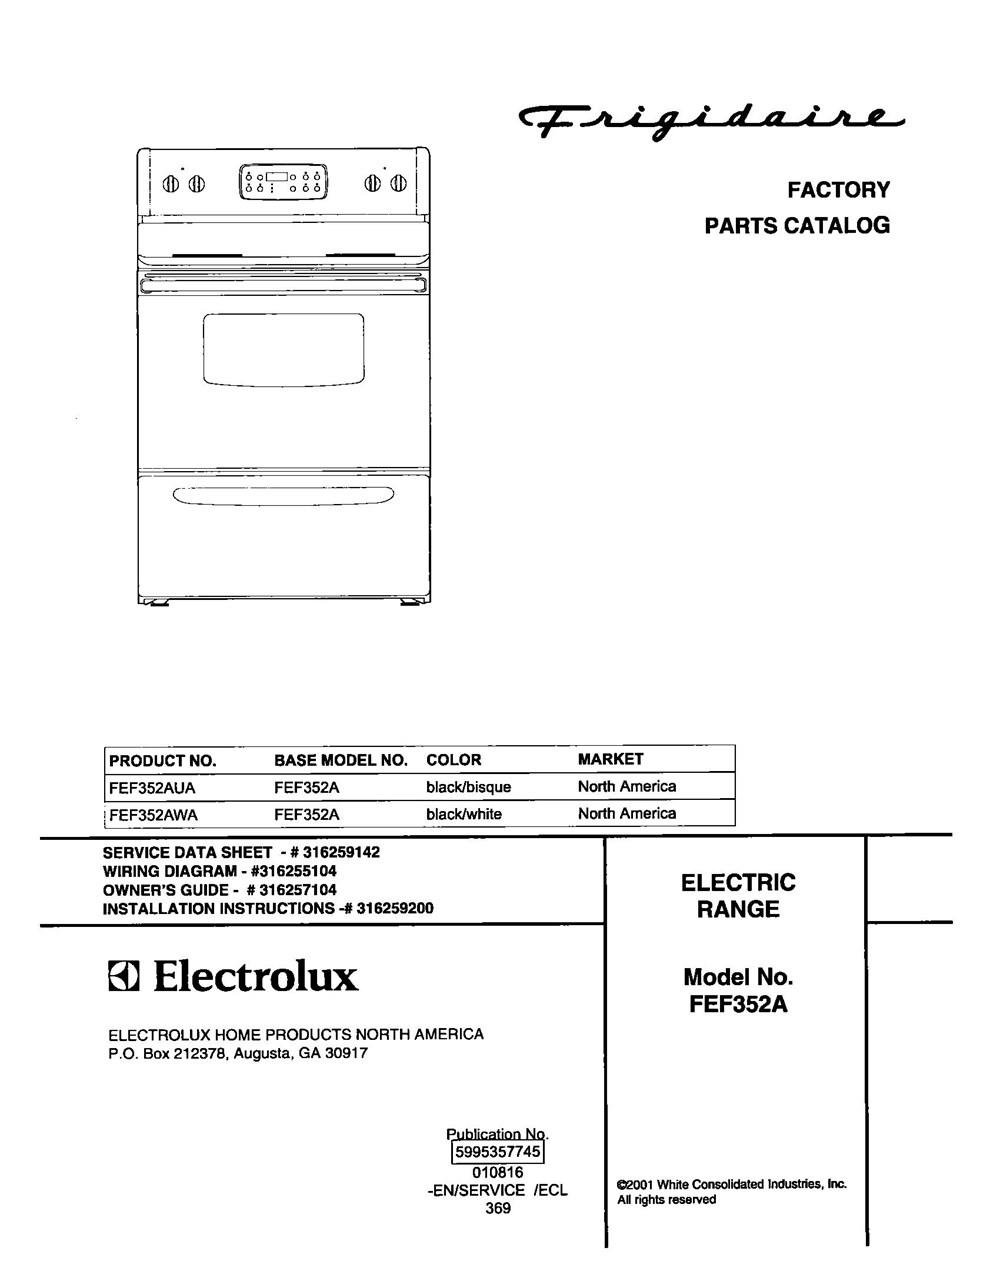 Fef352awa Frigidaire Company Backguard 05body 07top Drawer 09door 01cover 10wiring Diagram